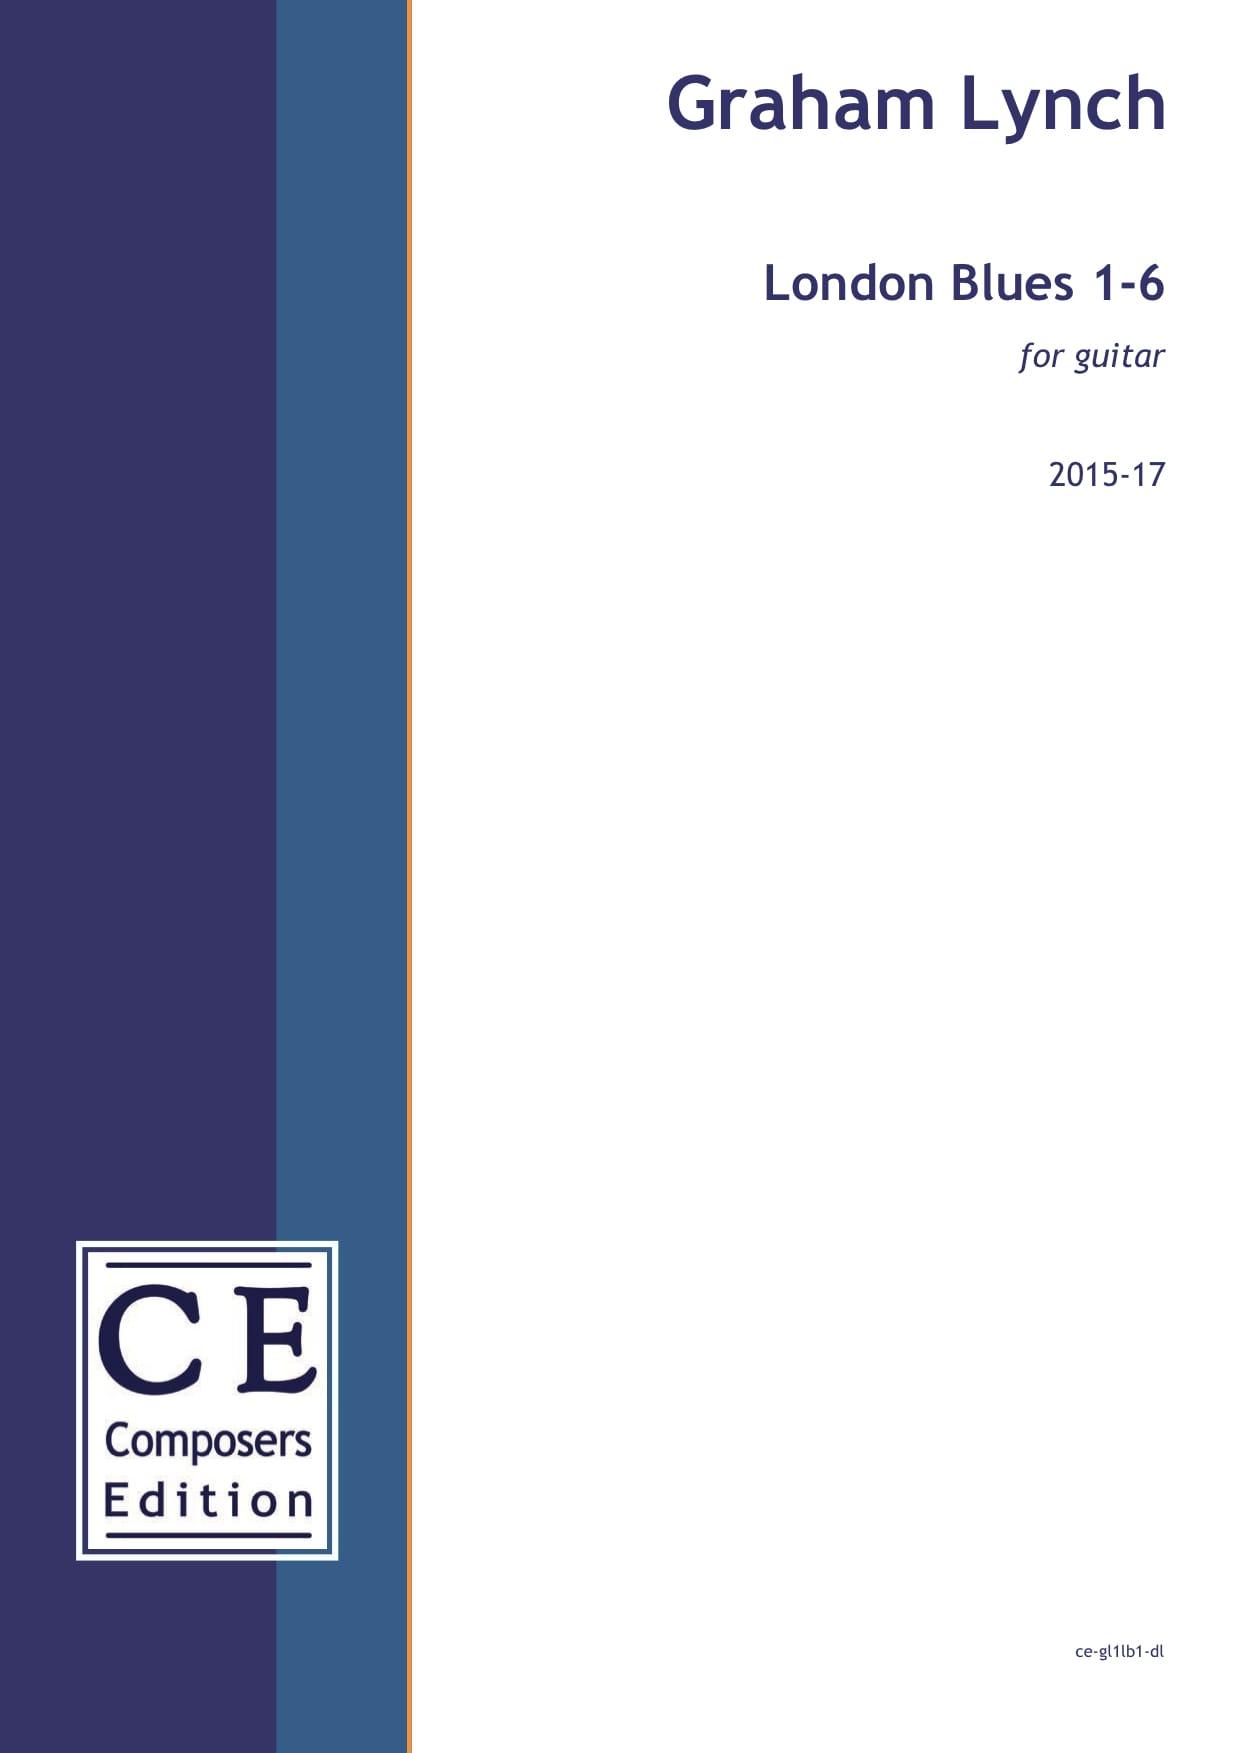 Graham Lynch: London Blues 1-6 for guitar